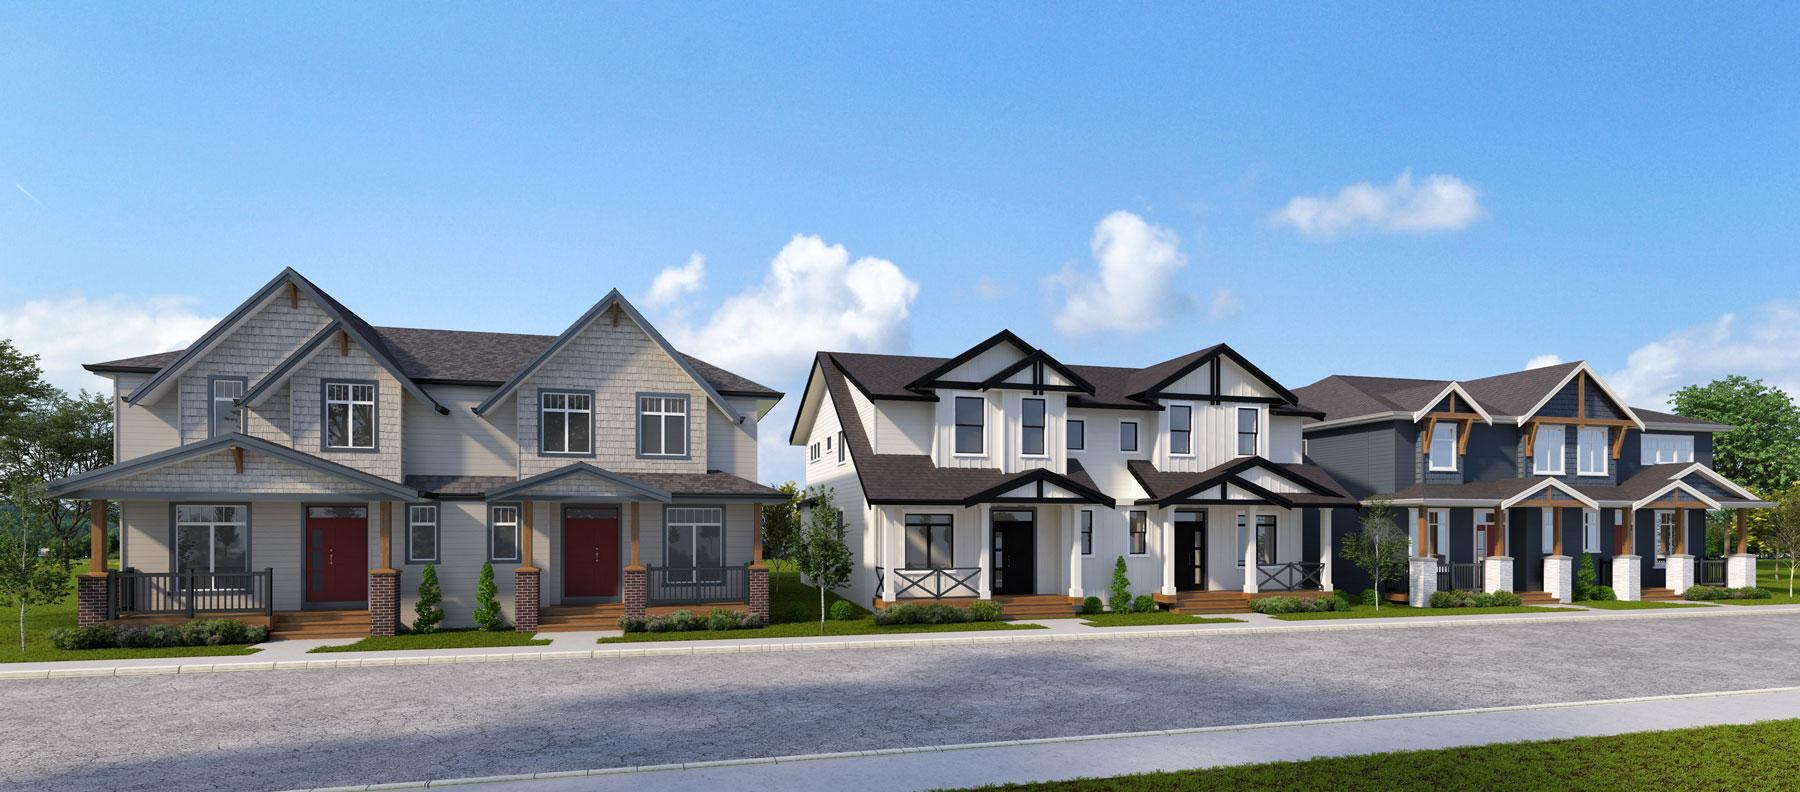 20525 76 Ave Duplex Units Rendering